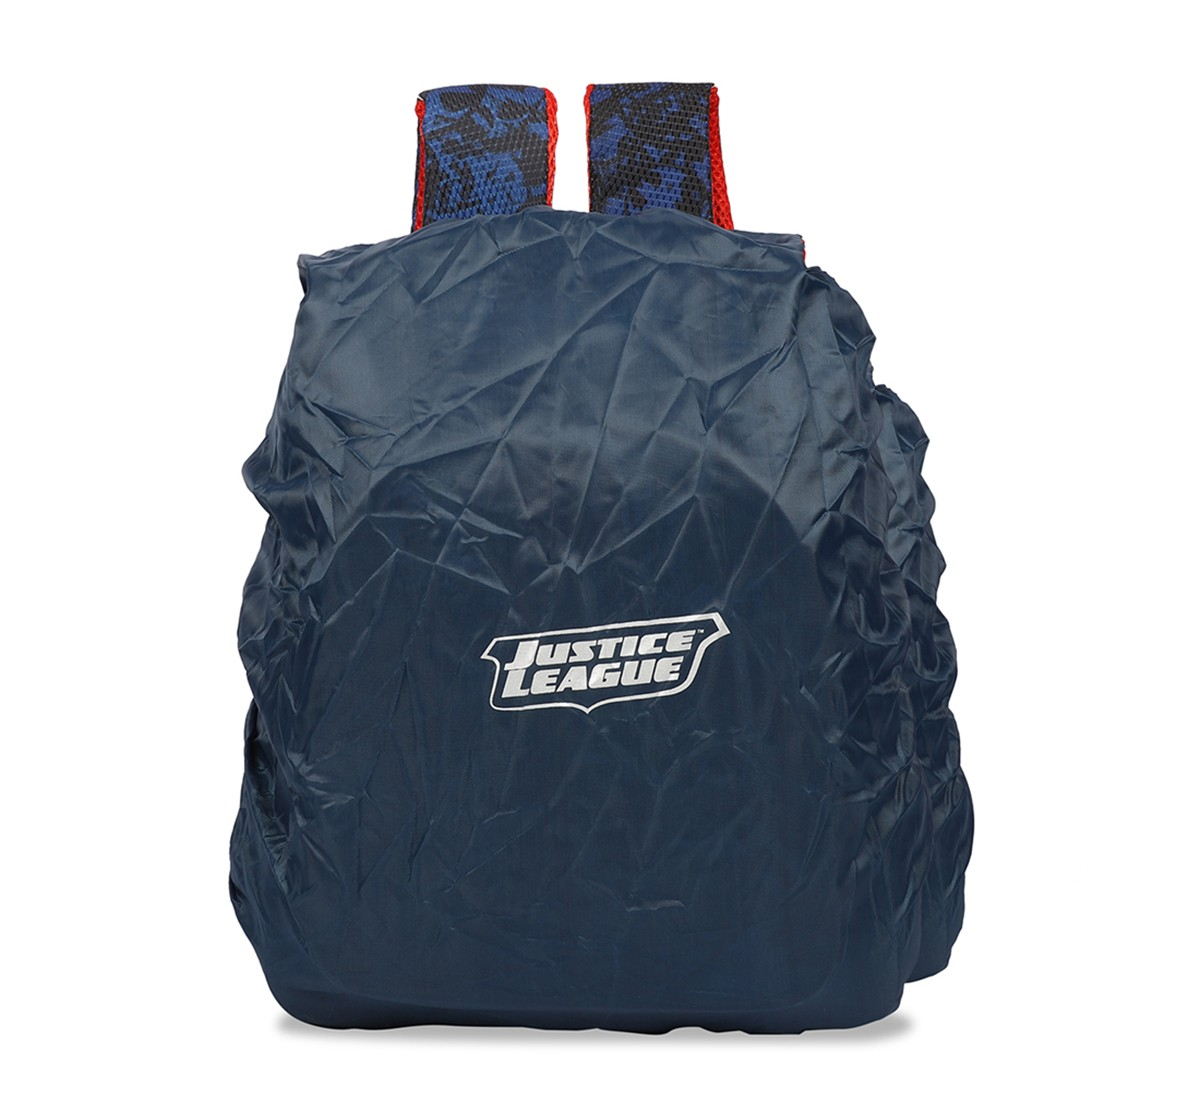 Dc Justice League School Bag 41 Cm Bags for Boys age 7Y+